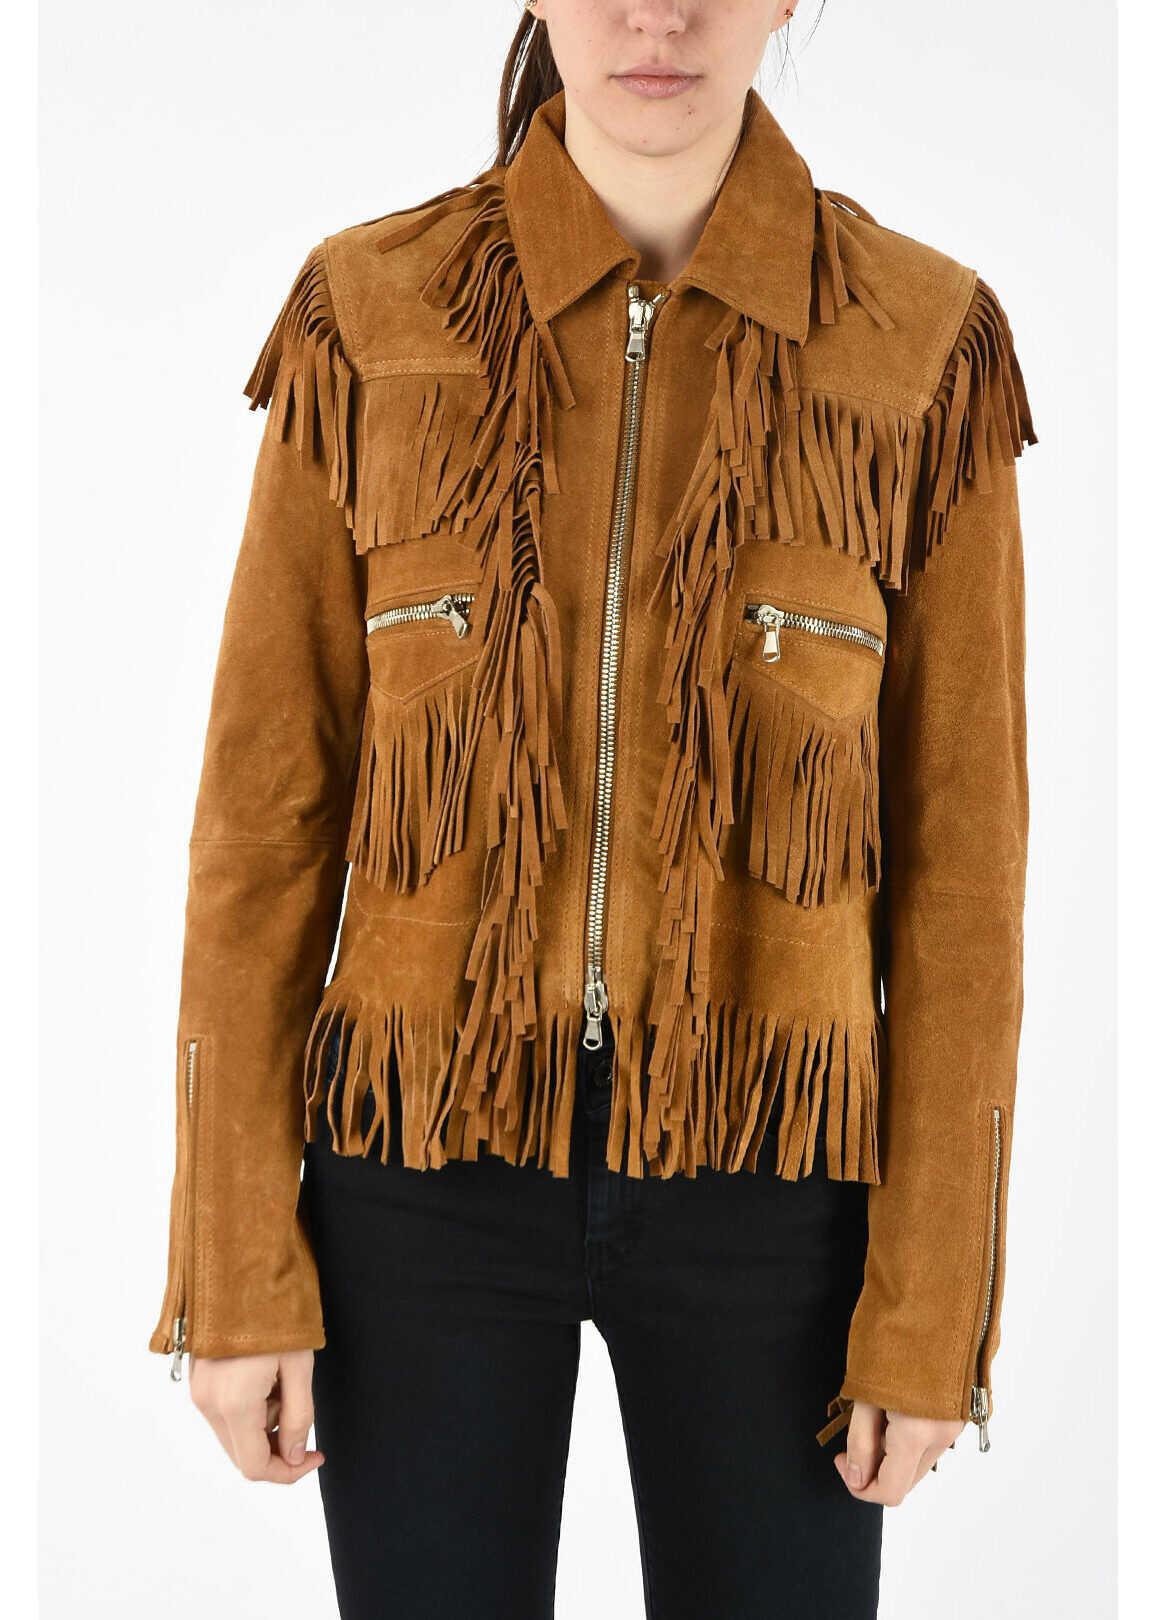 Diesel BLACK GOLD Suede Leather Frilled LAUL Jacket BROWN